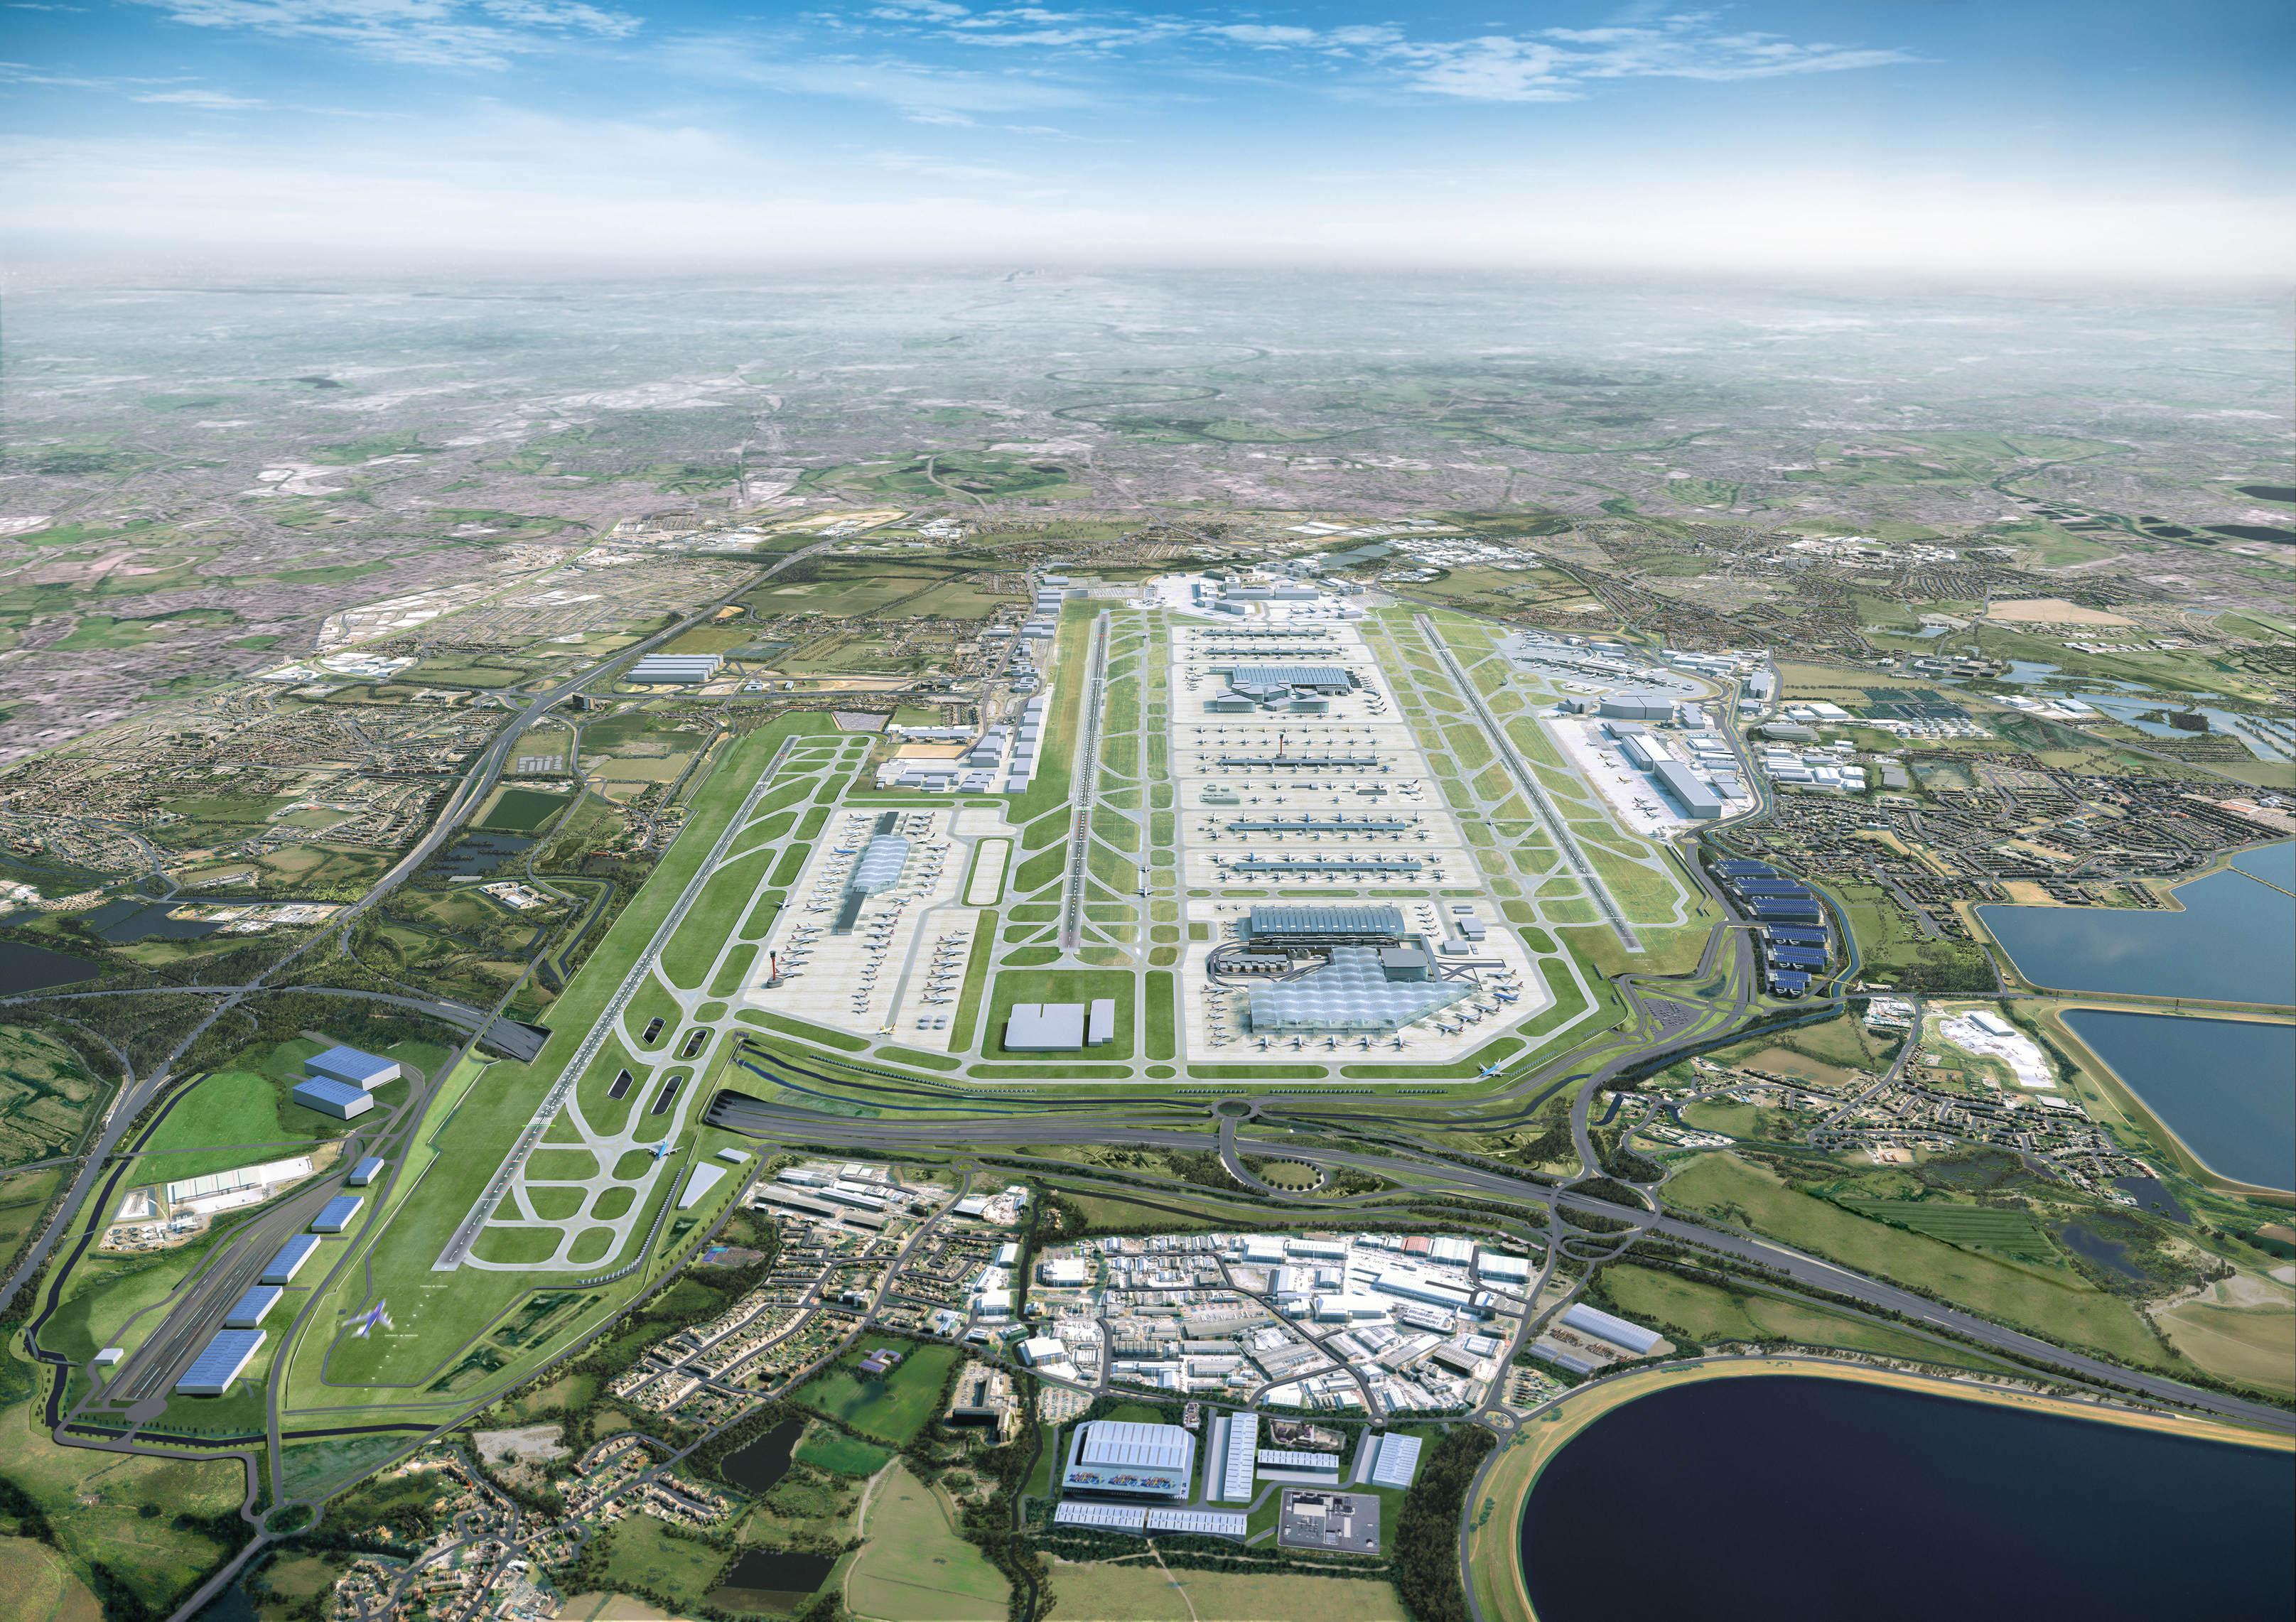 Heathrow expansion aerial